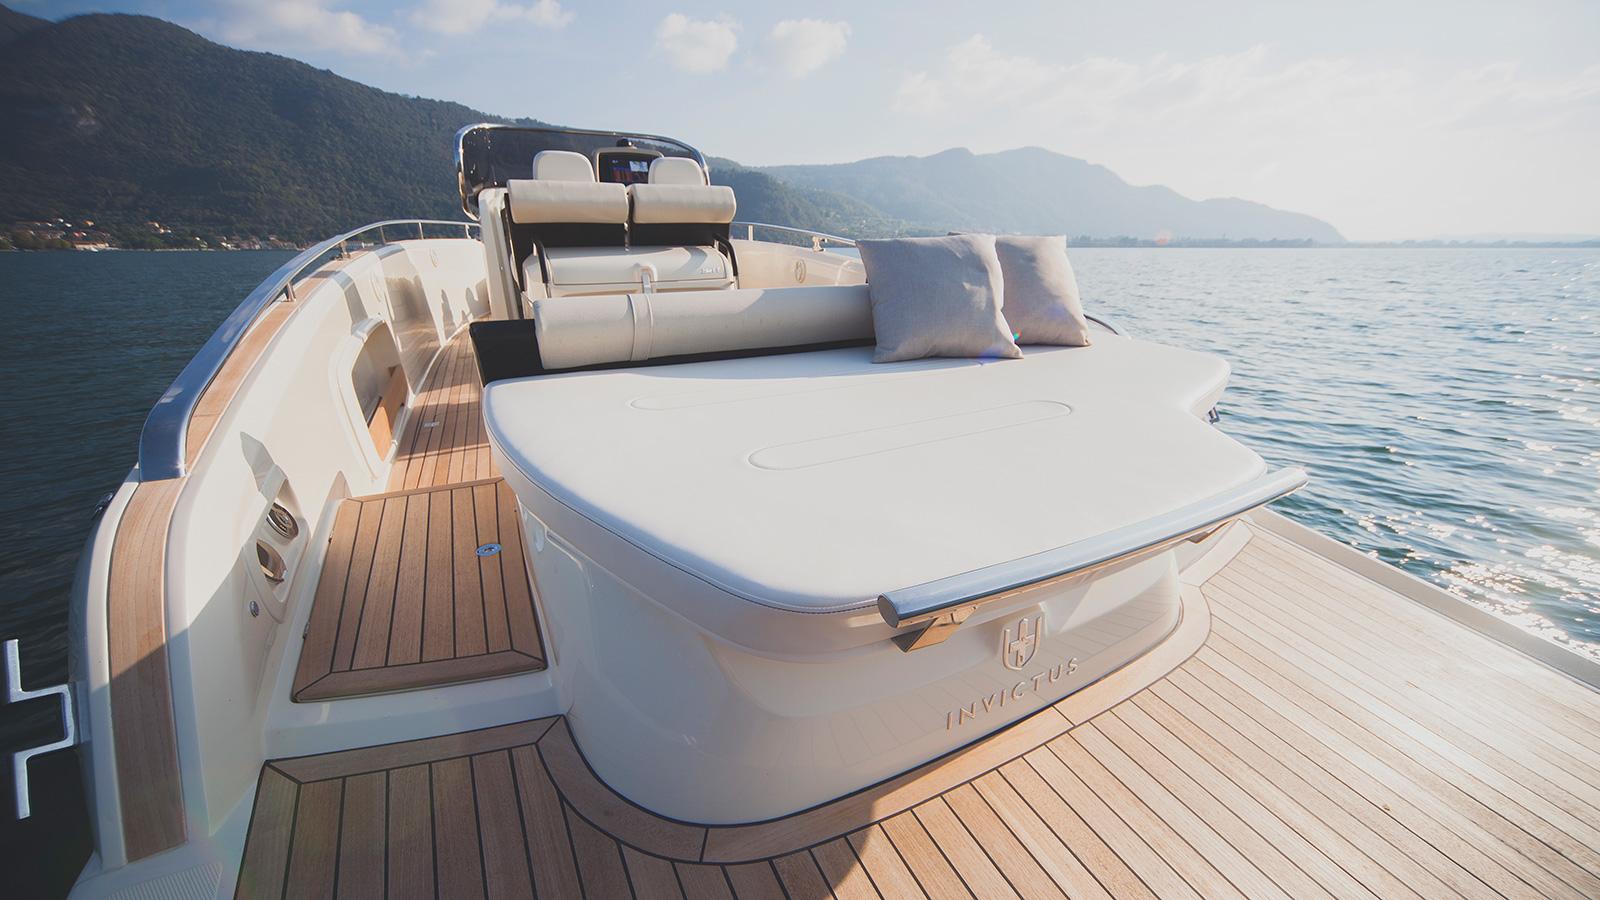 Invictus 280tt Yacht Cc